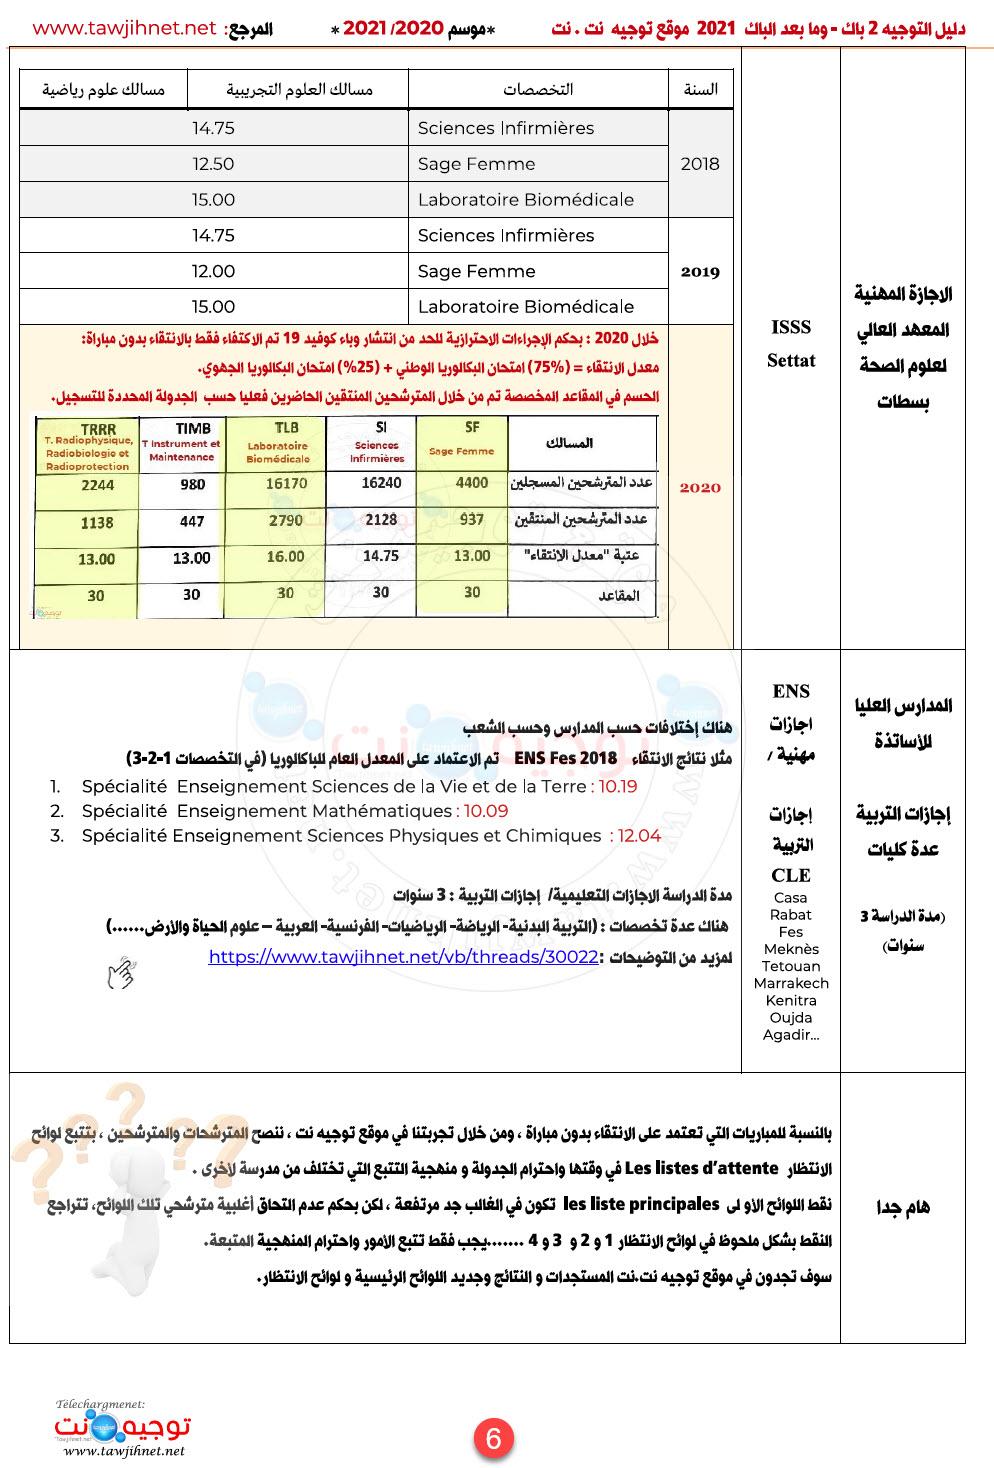 seuils-preselection-ecoles-instituts-maroc-2021_Page_6.jpg